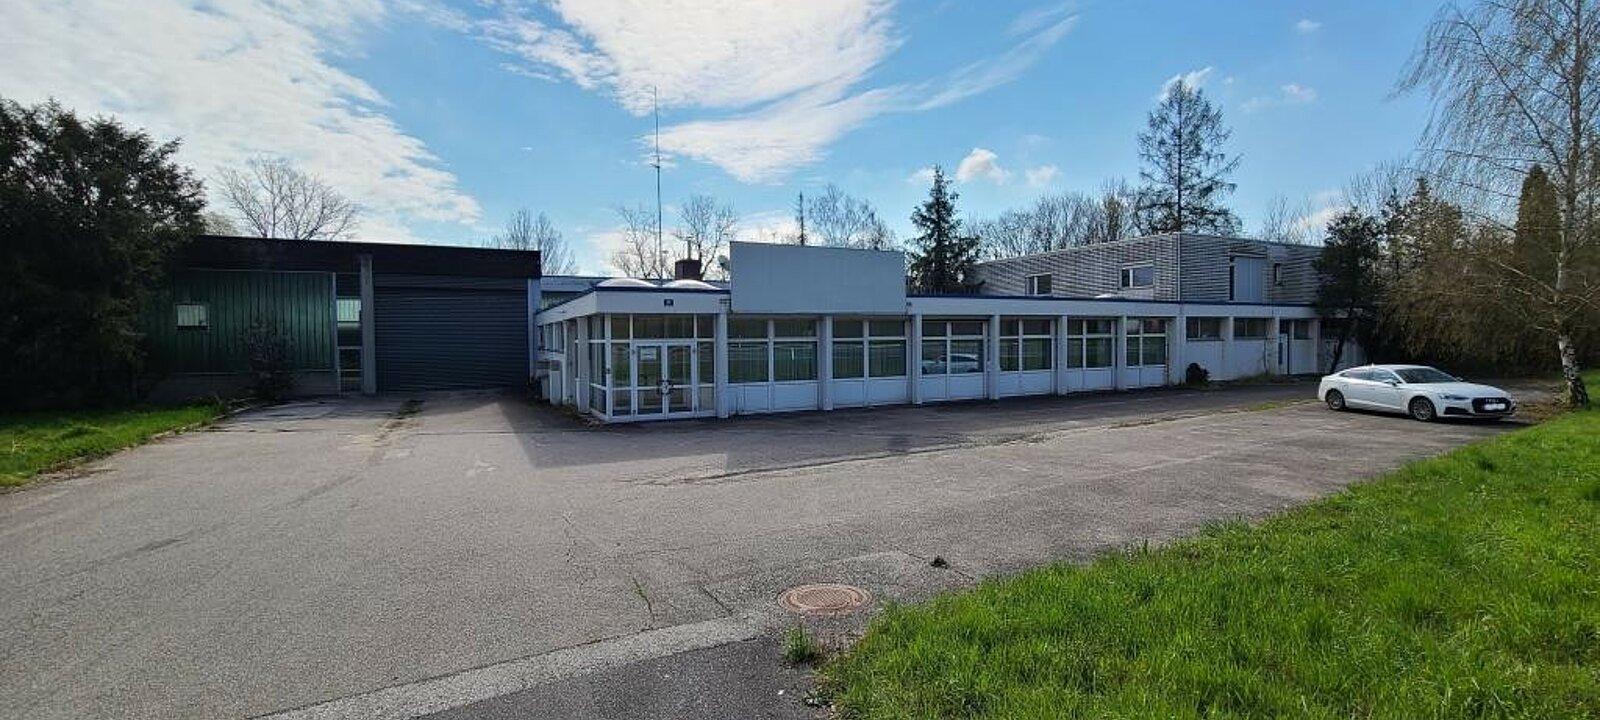 Betriebsgebäude